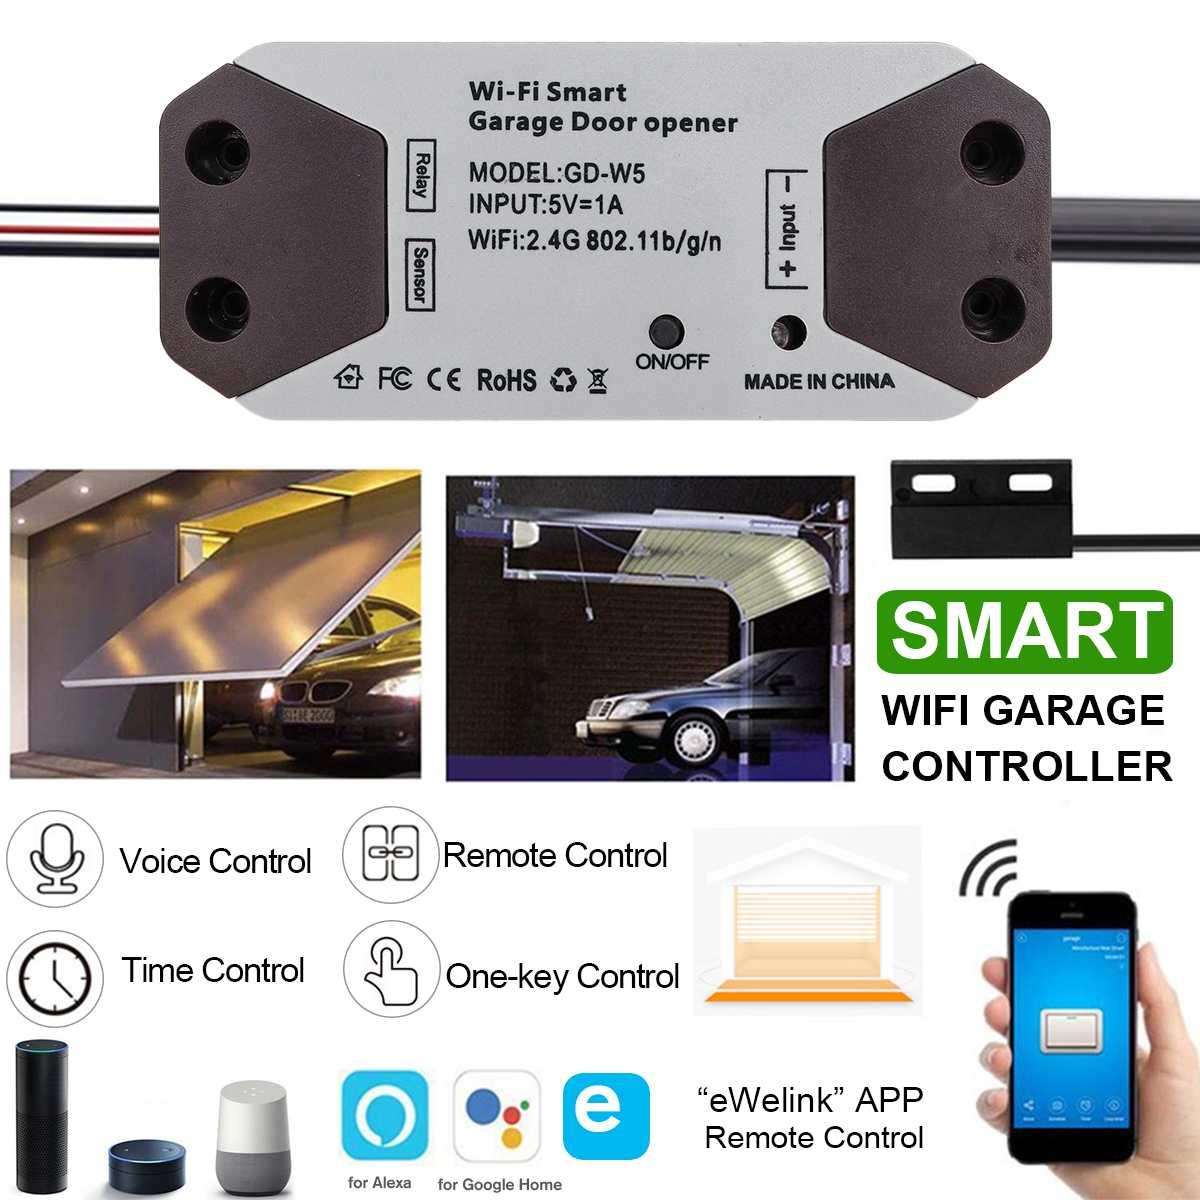 WiFi Smart Garage Door Opener Switch APP Remote Control Garage Open Close Monitor for Google Home for Echo for Alexa